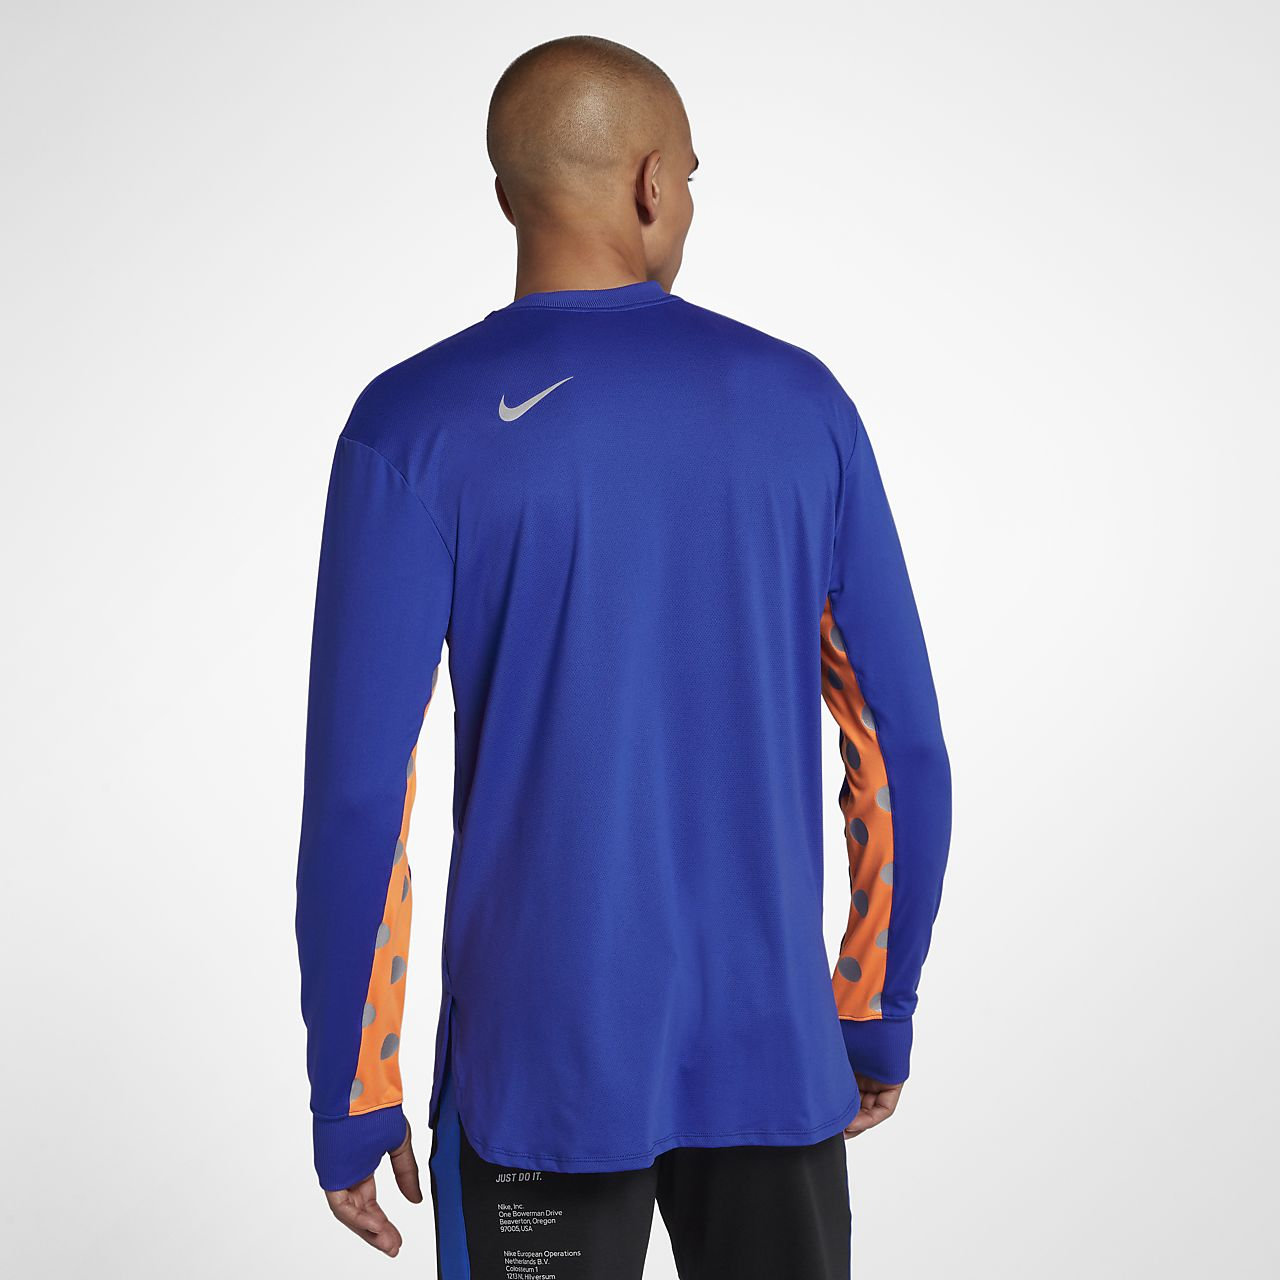 2396d77e5 Nike Mens Racer Long Sleeve T Shirt – EDGE Engineering and ...